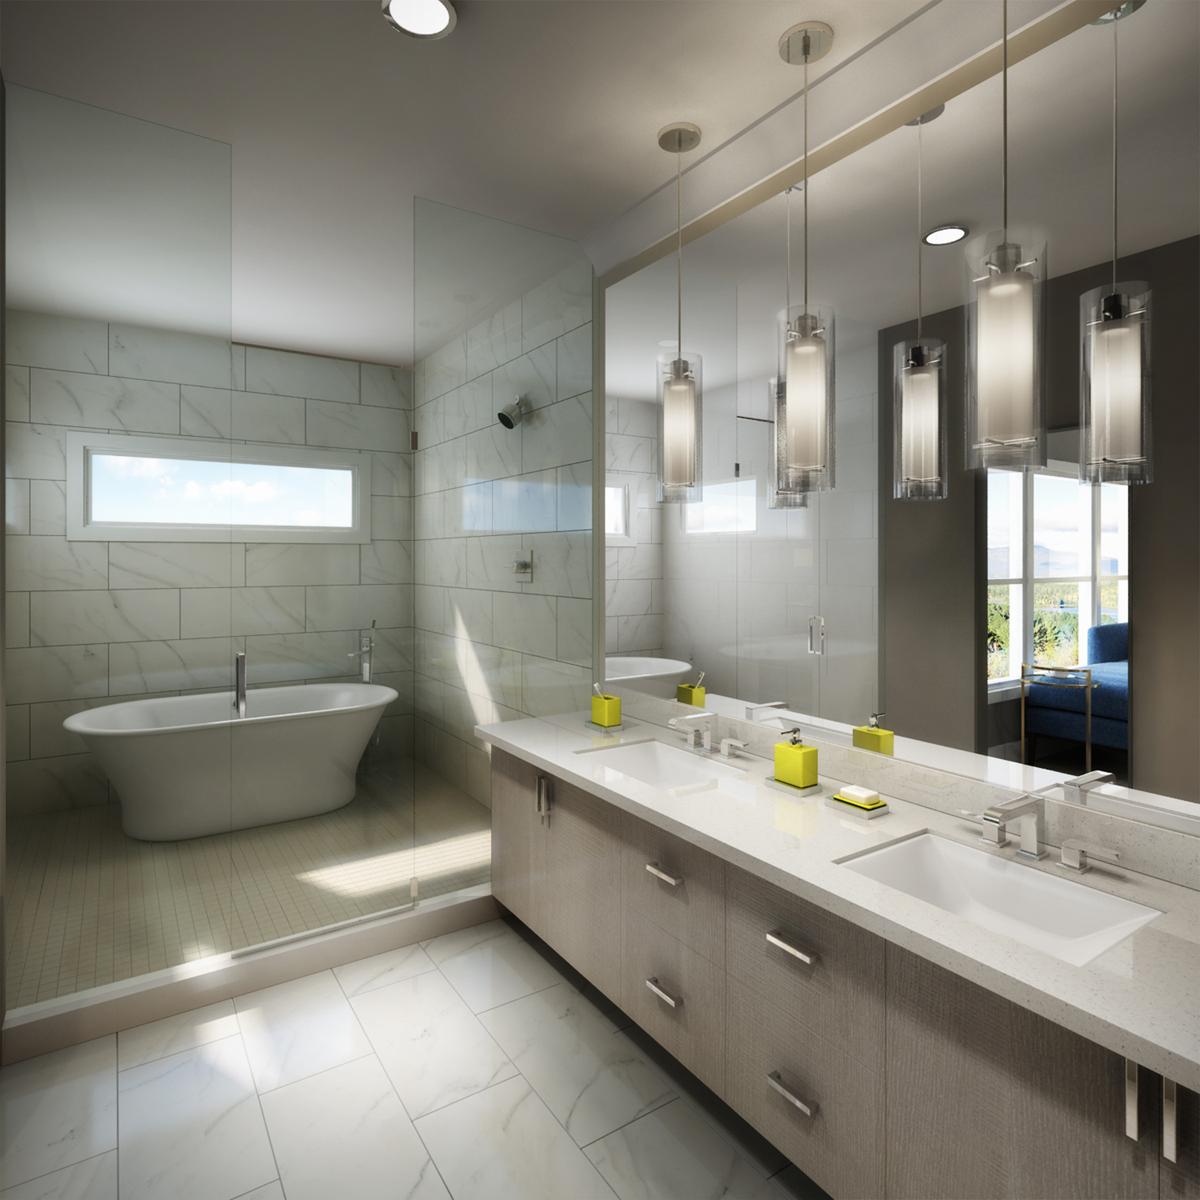 Additional photo for property listing at Luxury Townhome Next To Blackburn Park 3557 Blair Circle Atlanta, ジョージア 30319 アメリカ合衆国